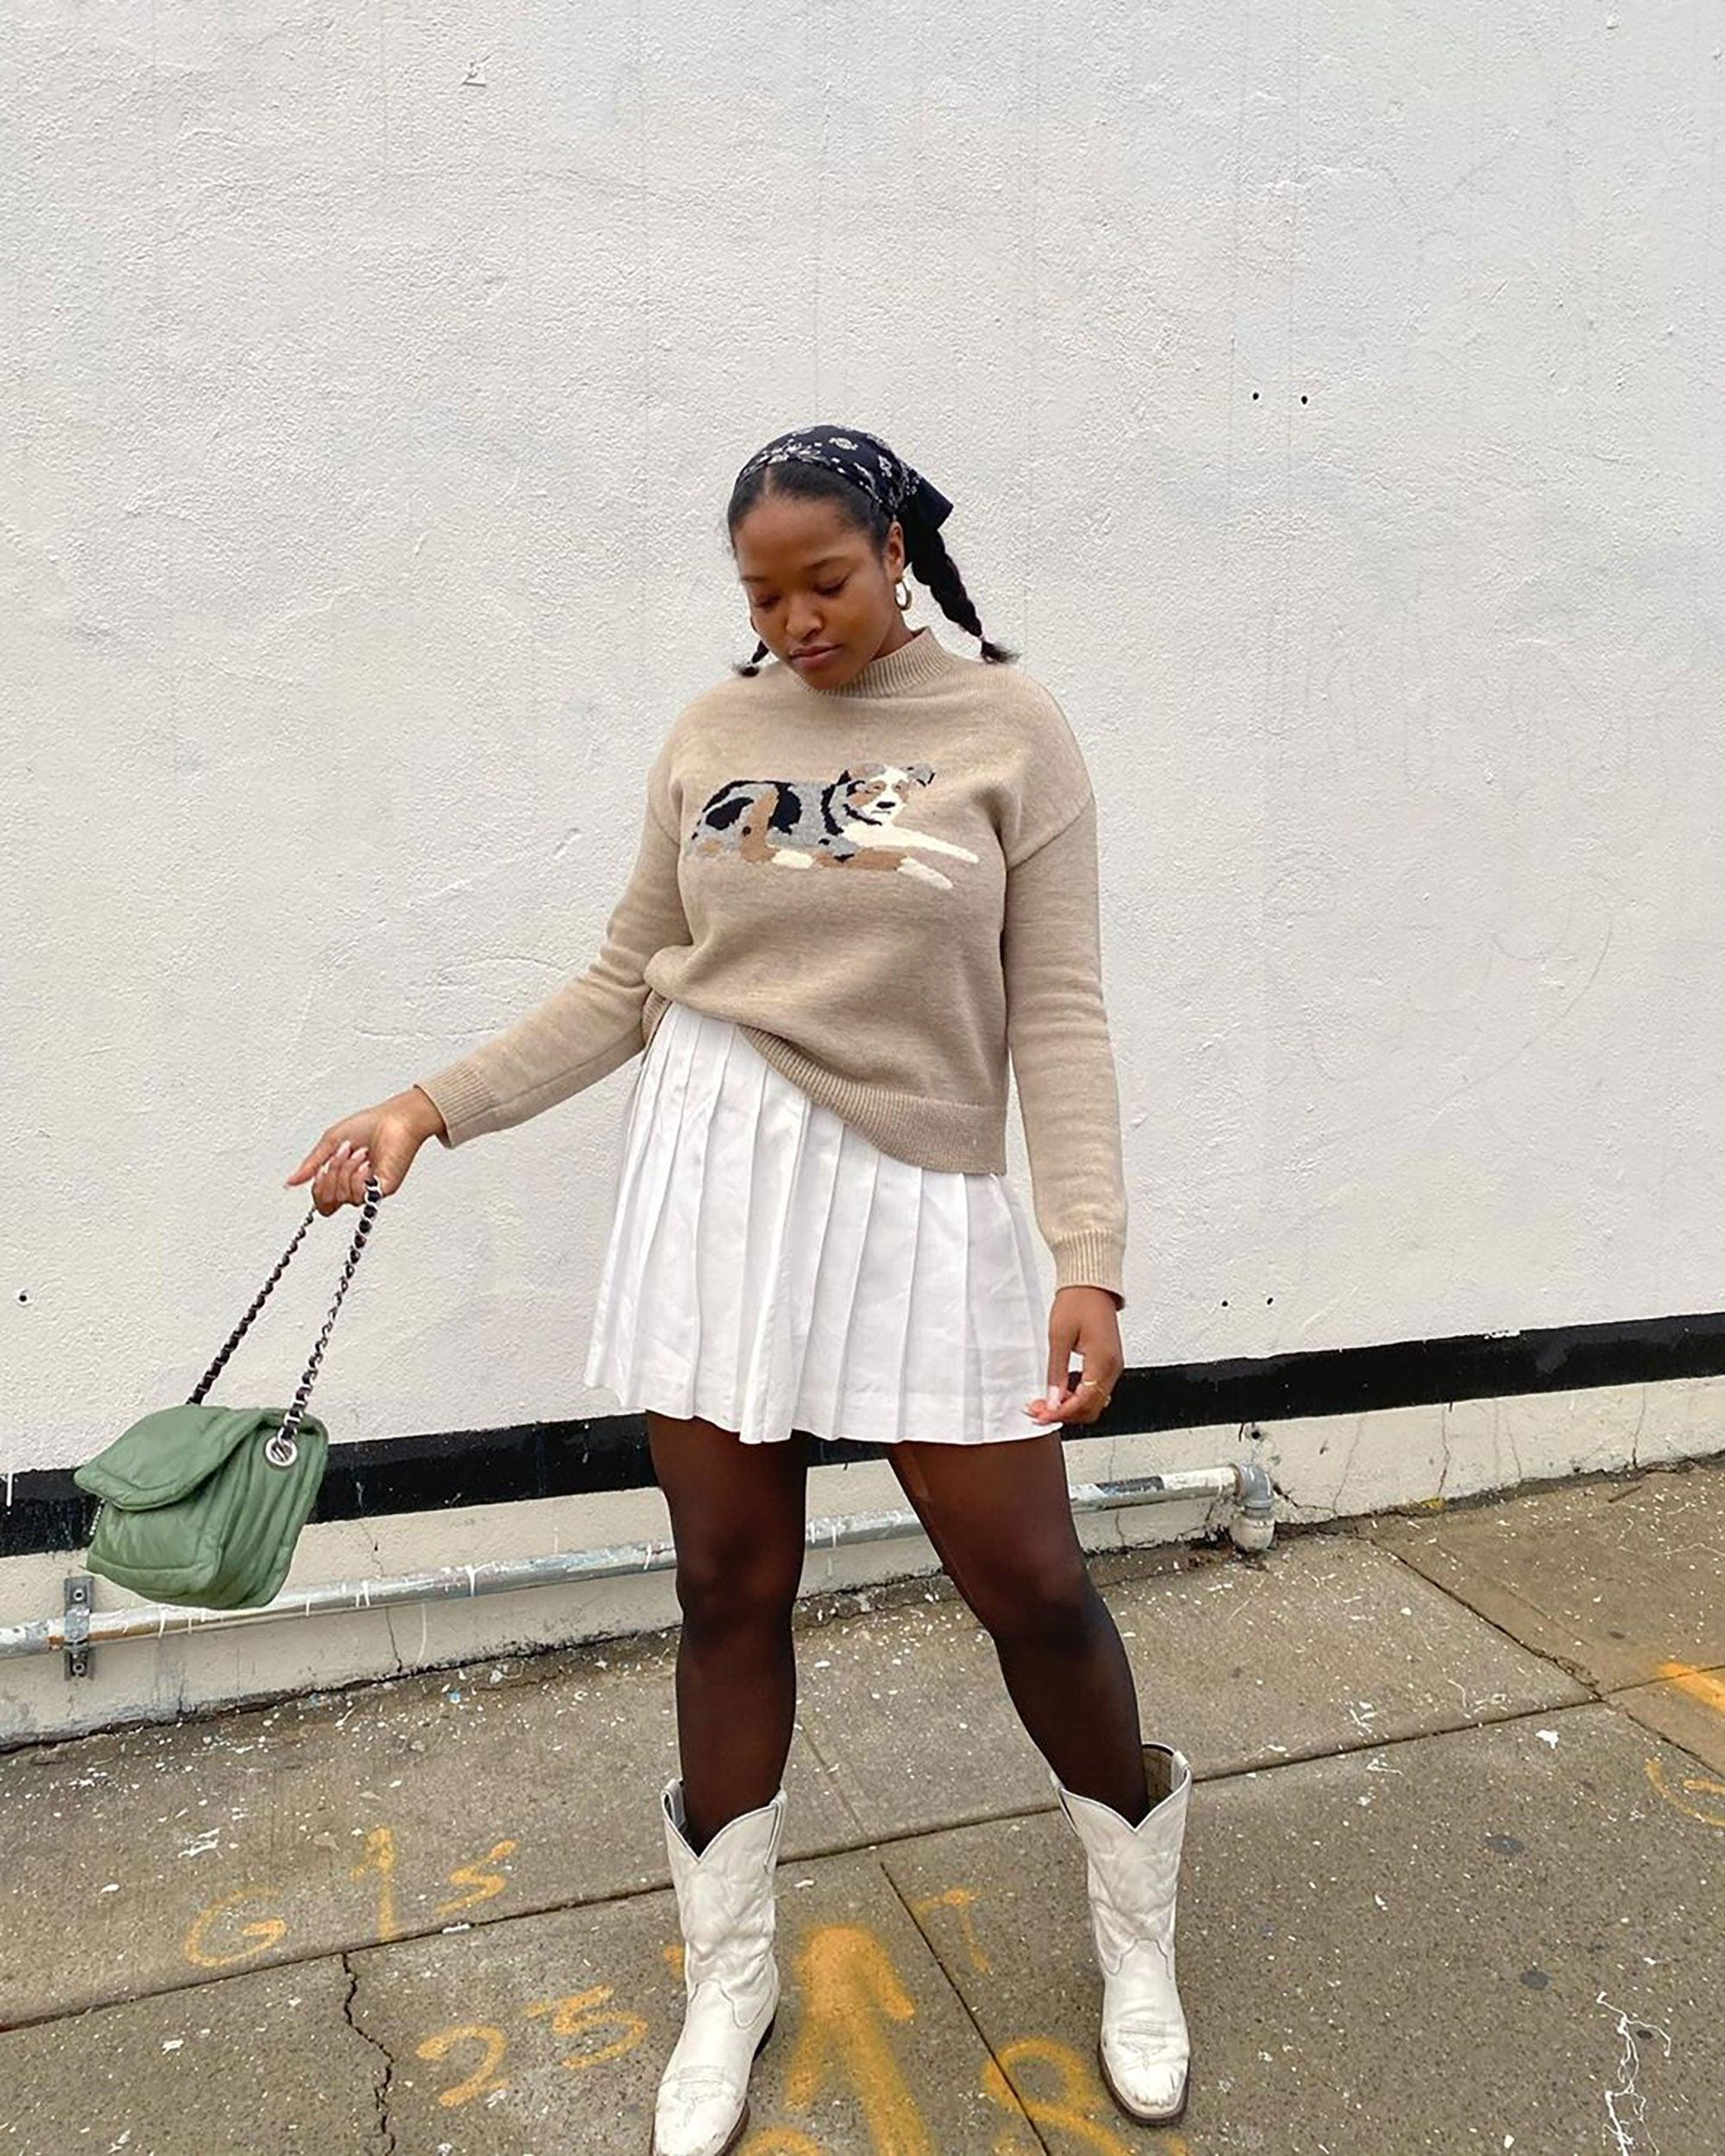 Shop The Tennis Skirt Trend From Depop To Tiktok